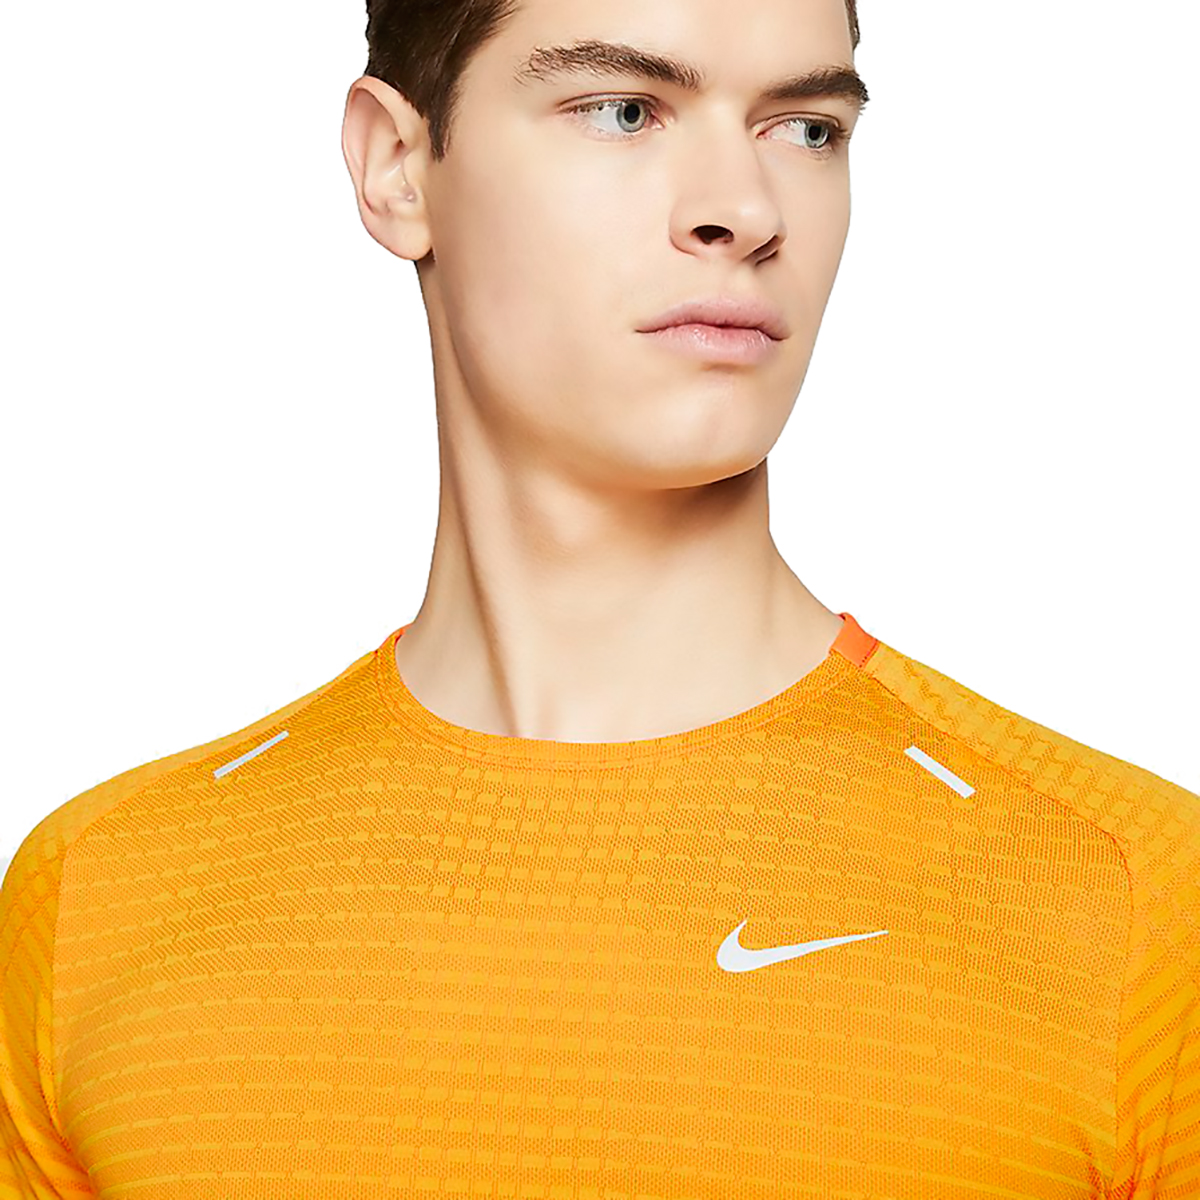 Men's Nike Techknit Ultra Short Sleeve  - Color: University Gold - Size: S, University Gold, large, image 3